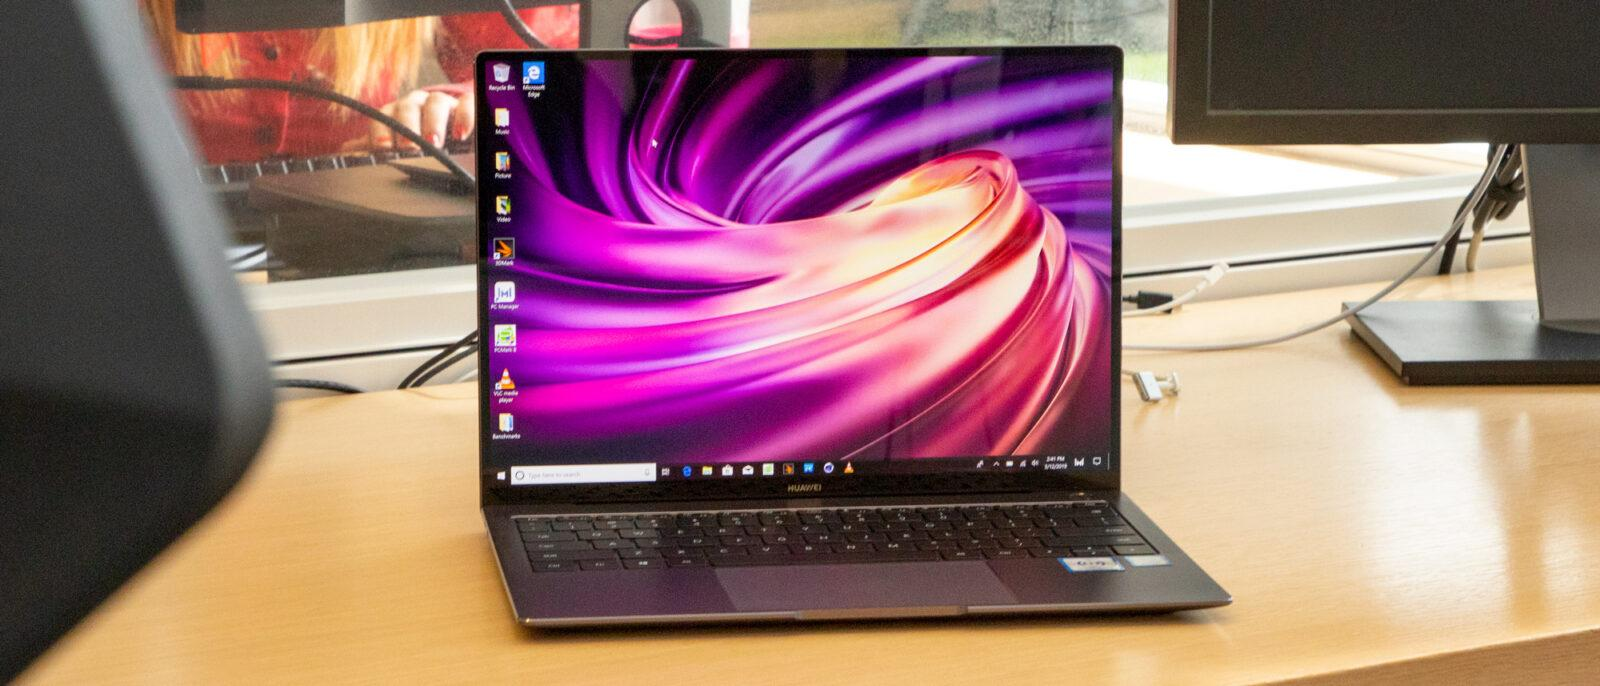 5 альтернатив новым MacBook Pro и MacBook Air (SmD7oDHofpThLjYA2ZtqGi)